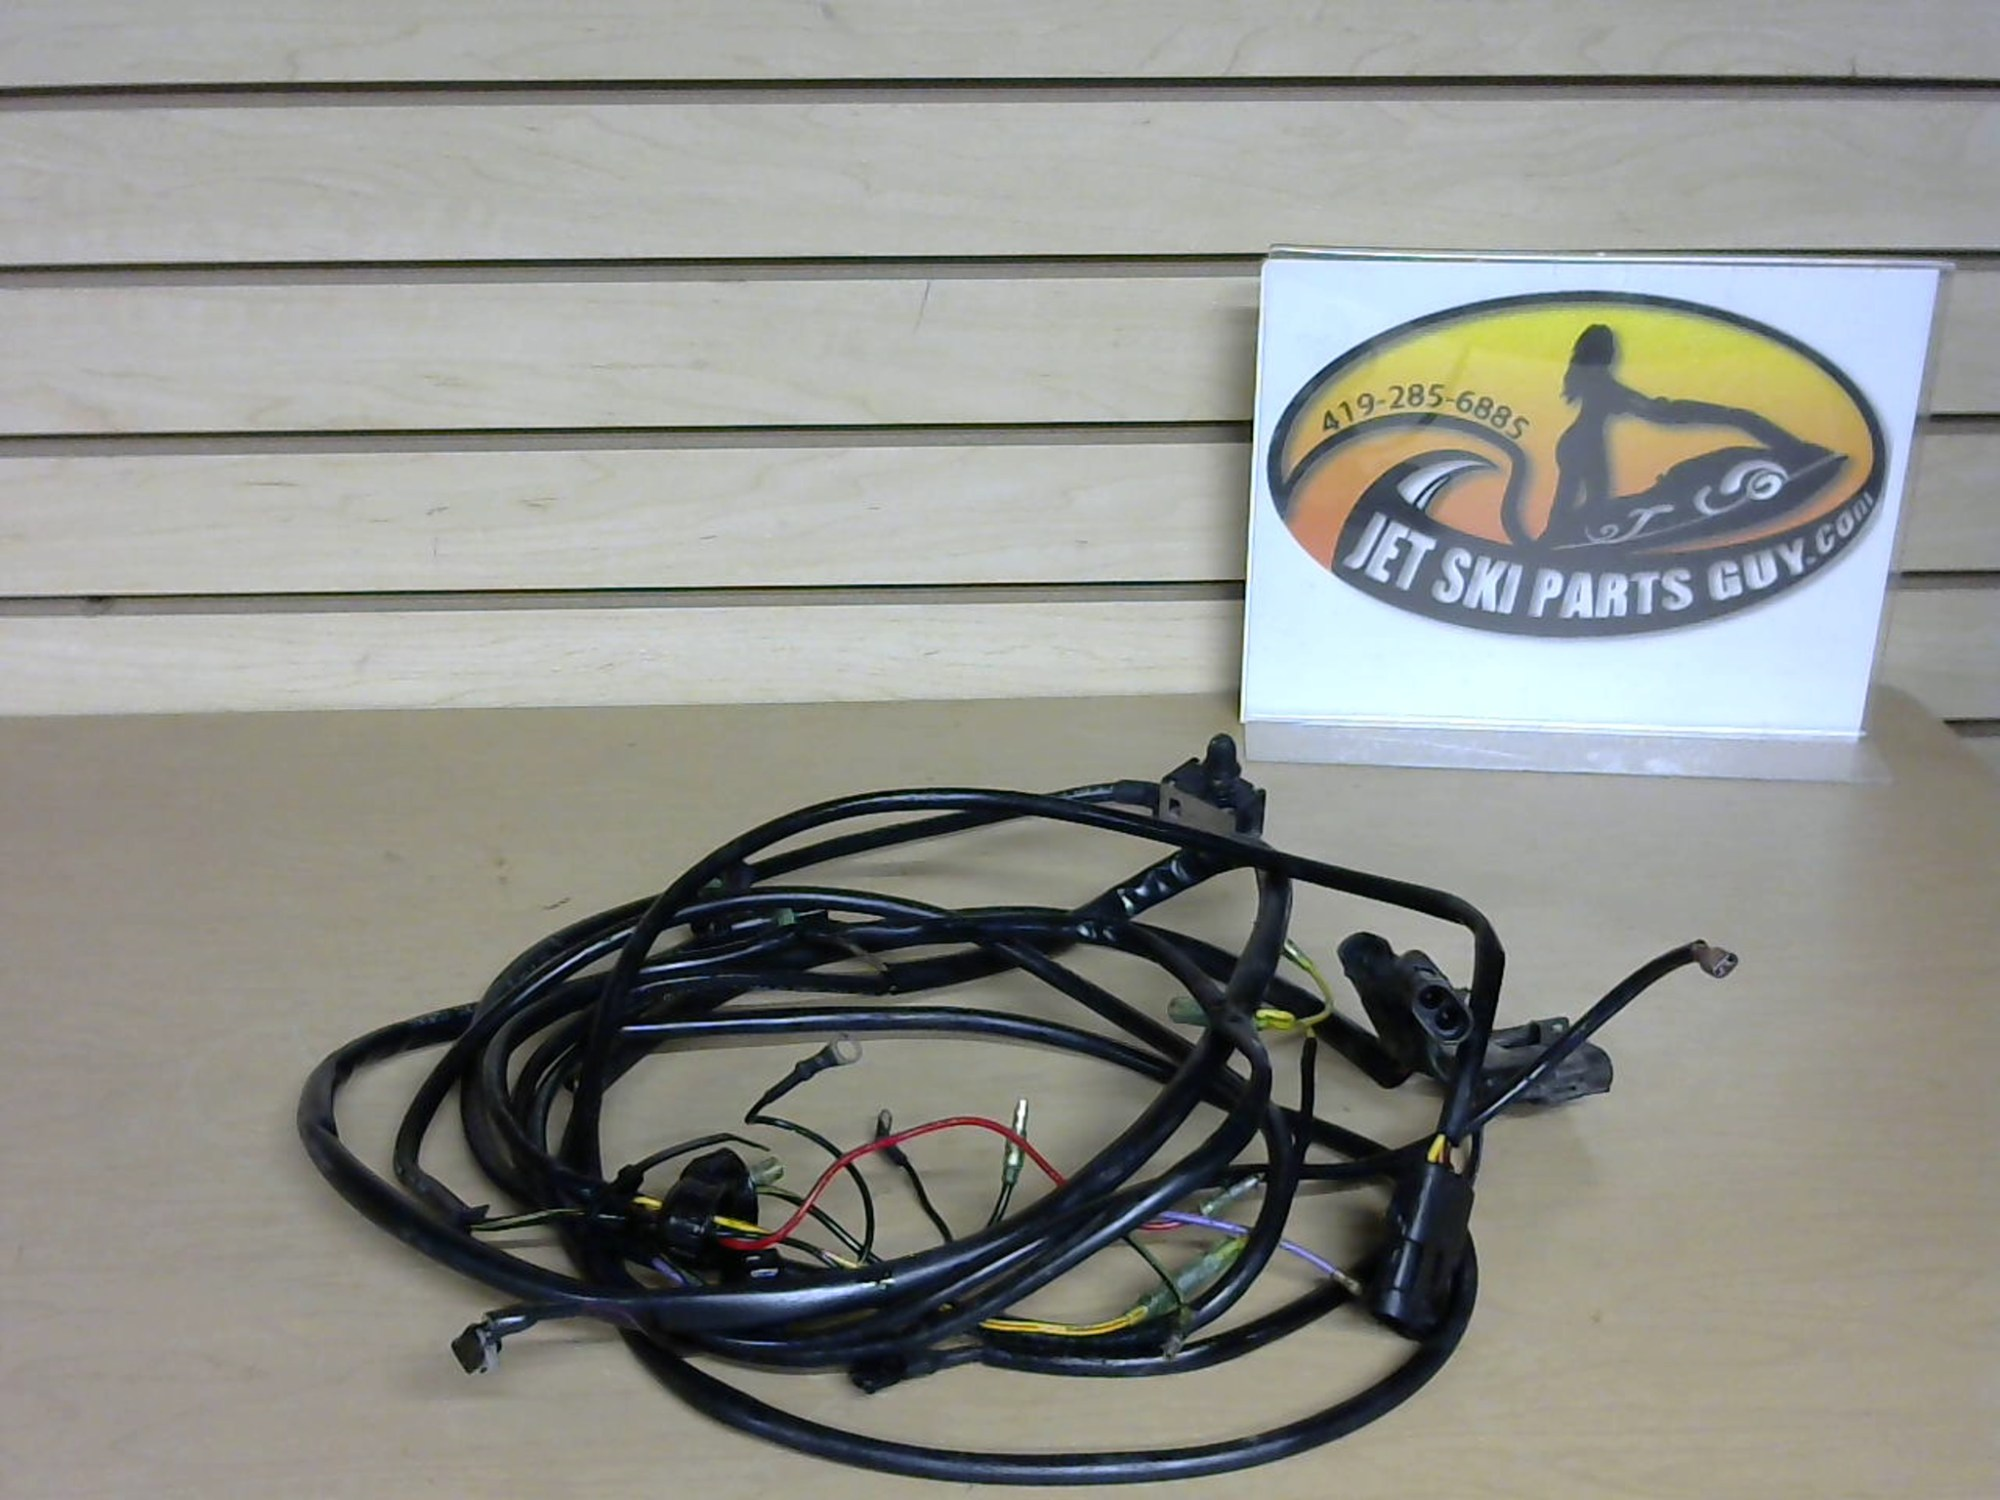 hight resolution of 1992 seadoo gtx main wiring harness seadoowiringharness92gtx